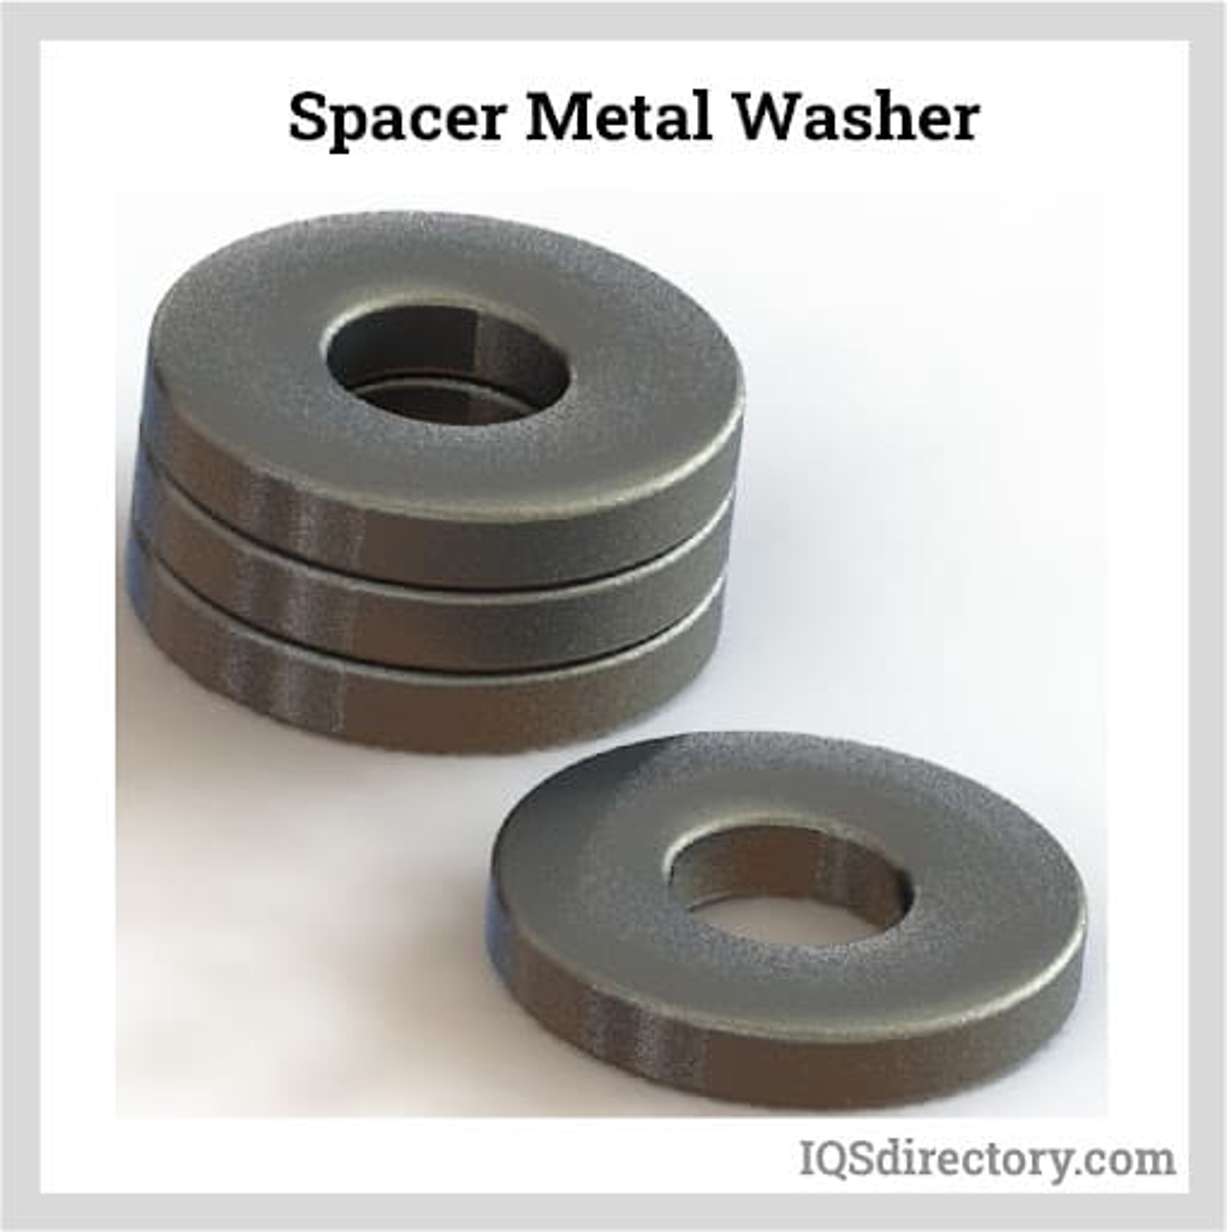 Spacer Metal Washer